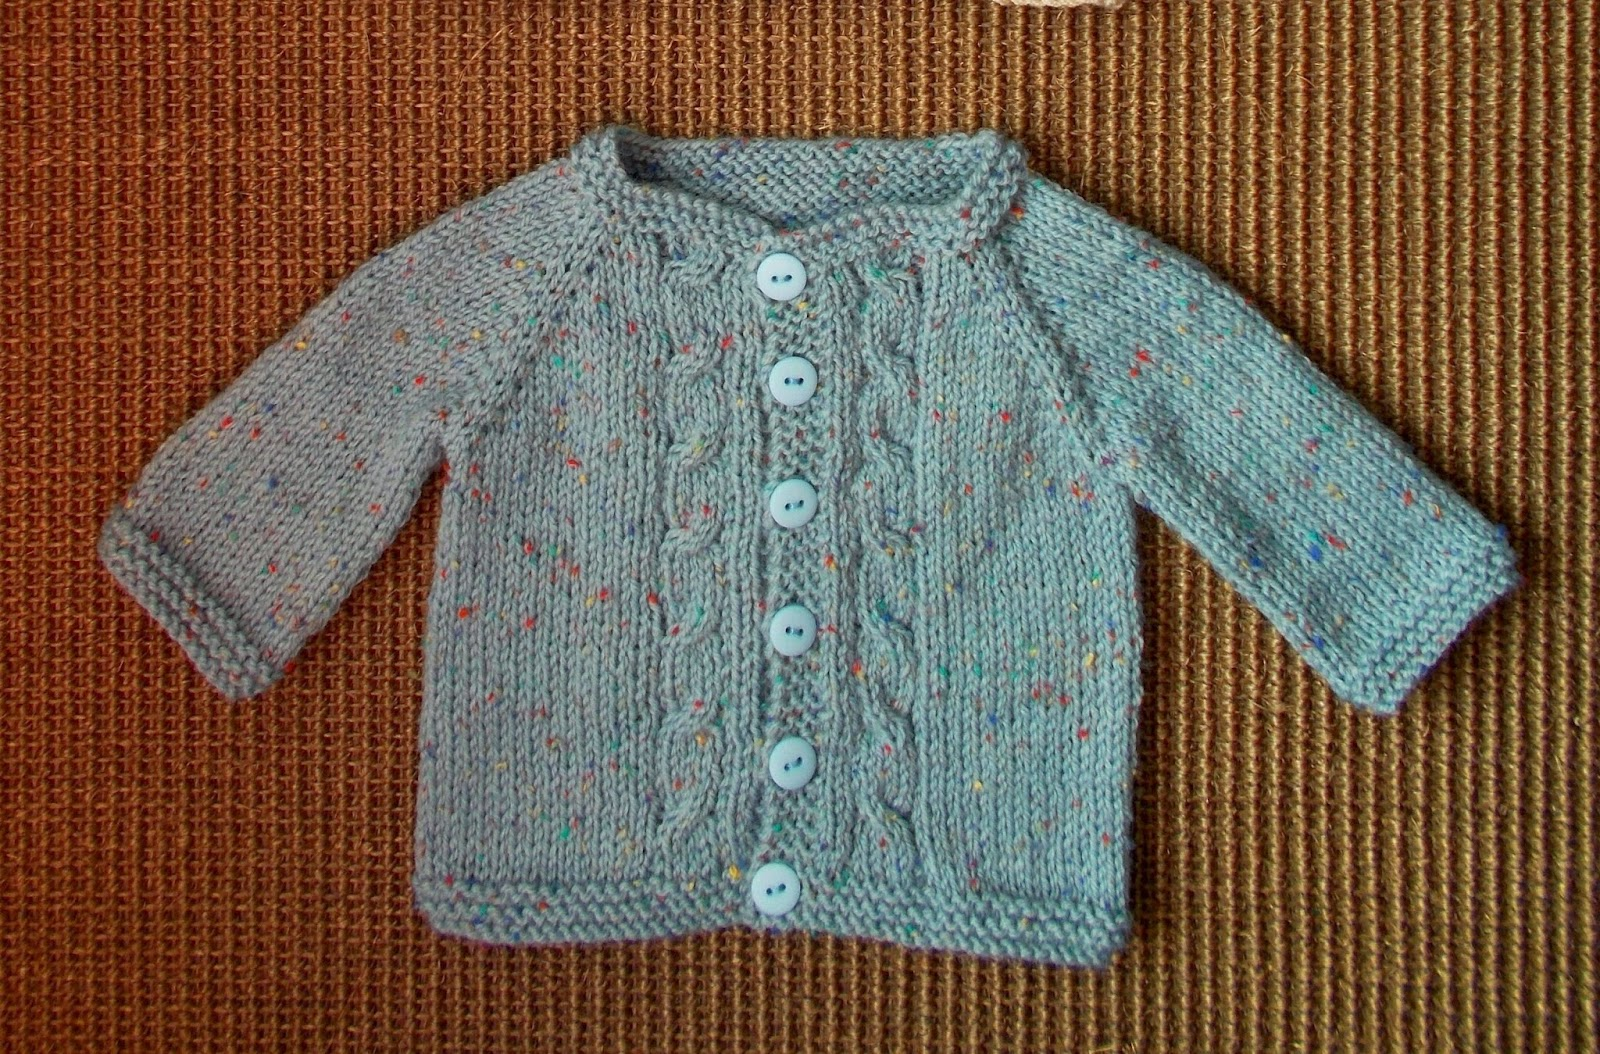 Knitting Yrn K2tog : Marianna s lazy daisy days max baby cardigan